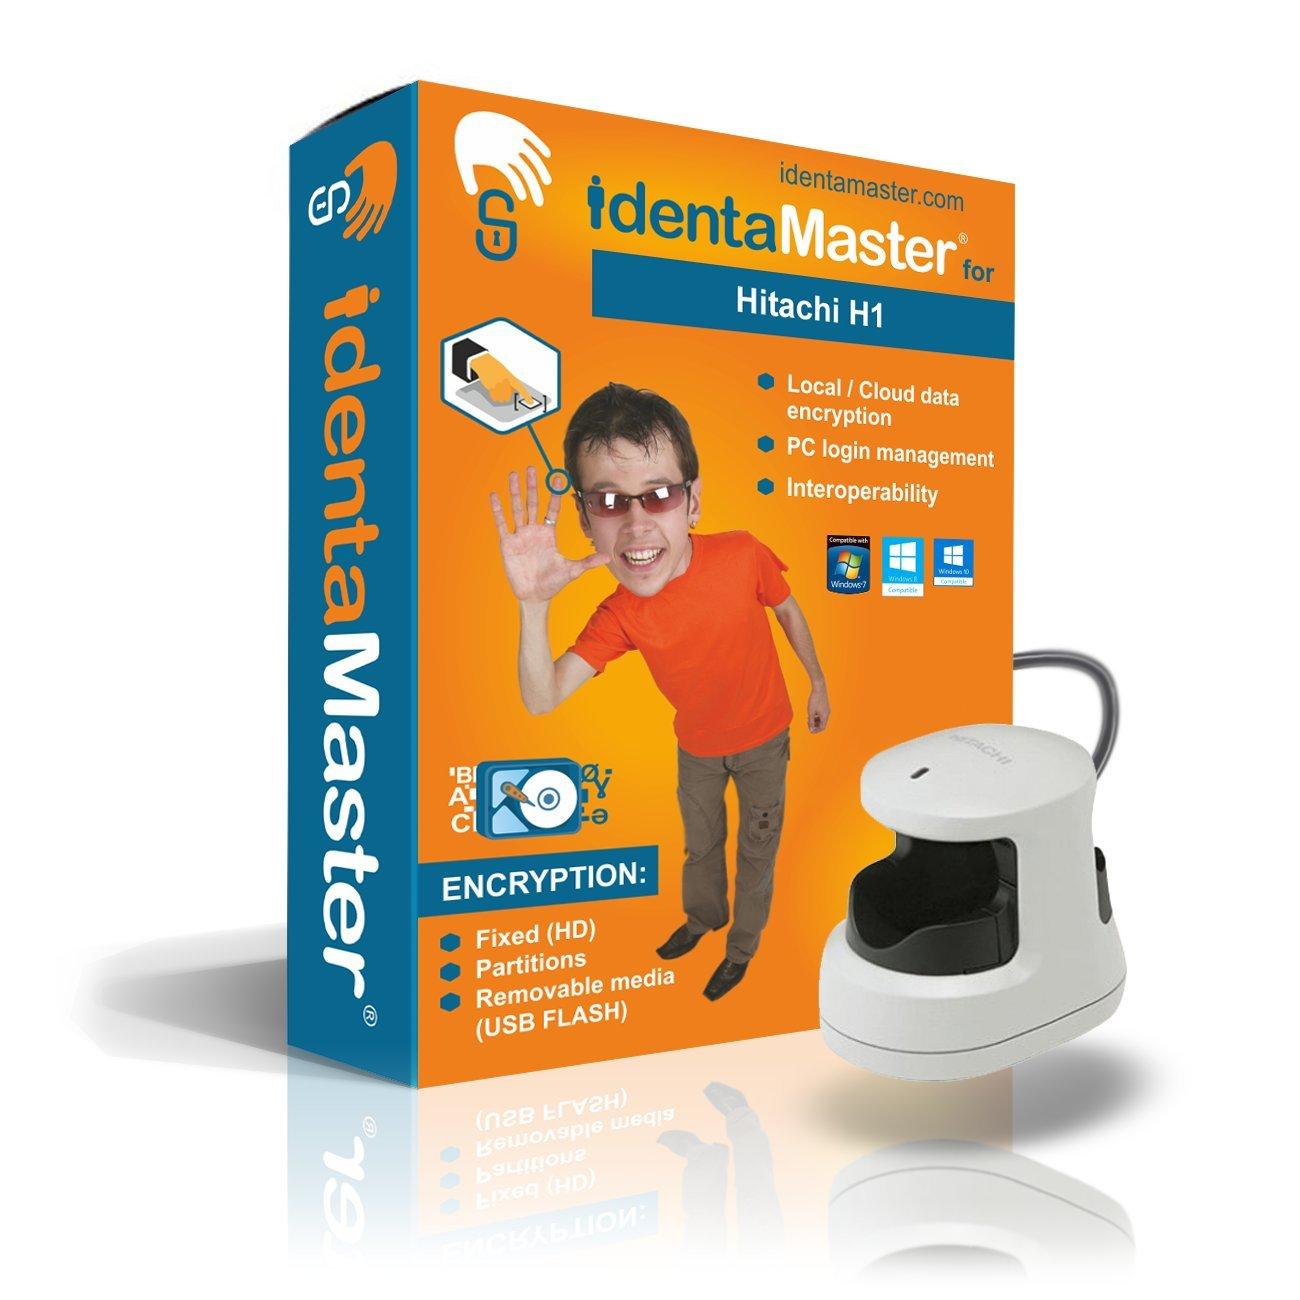 Hitachi H1 Finger Vein Reader with IdentaMaster Biometric Software (bundle) - Encryption, PC Login for Windows 7/8